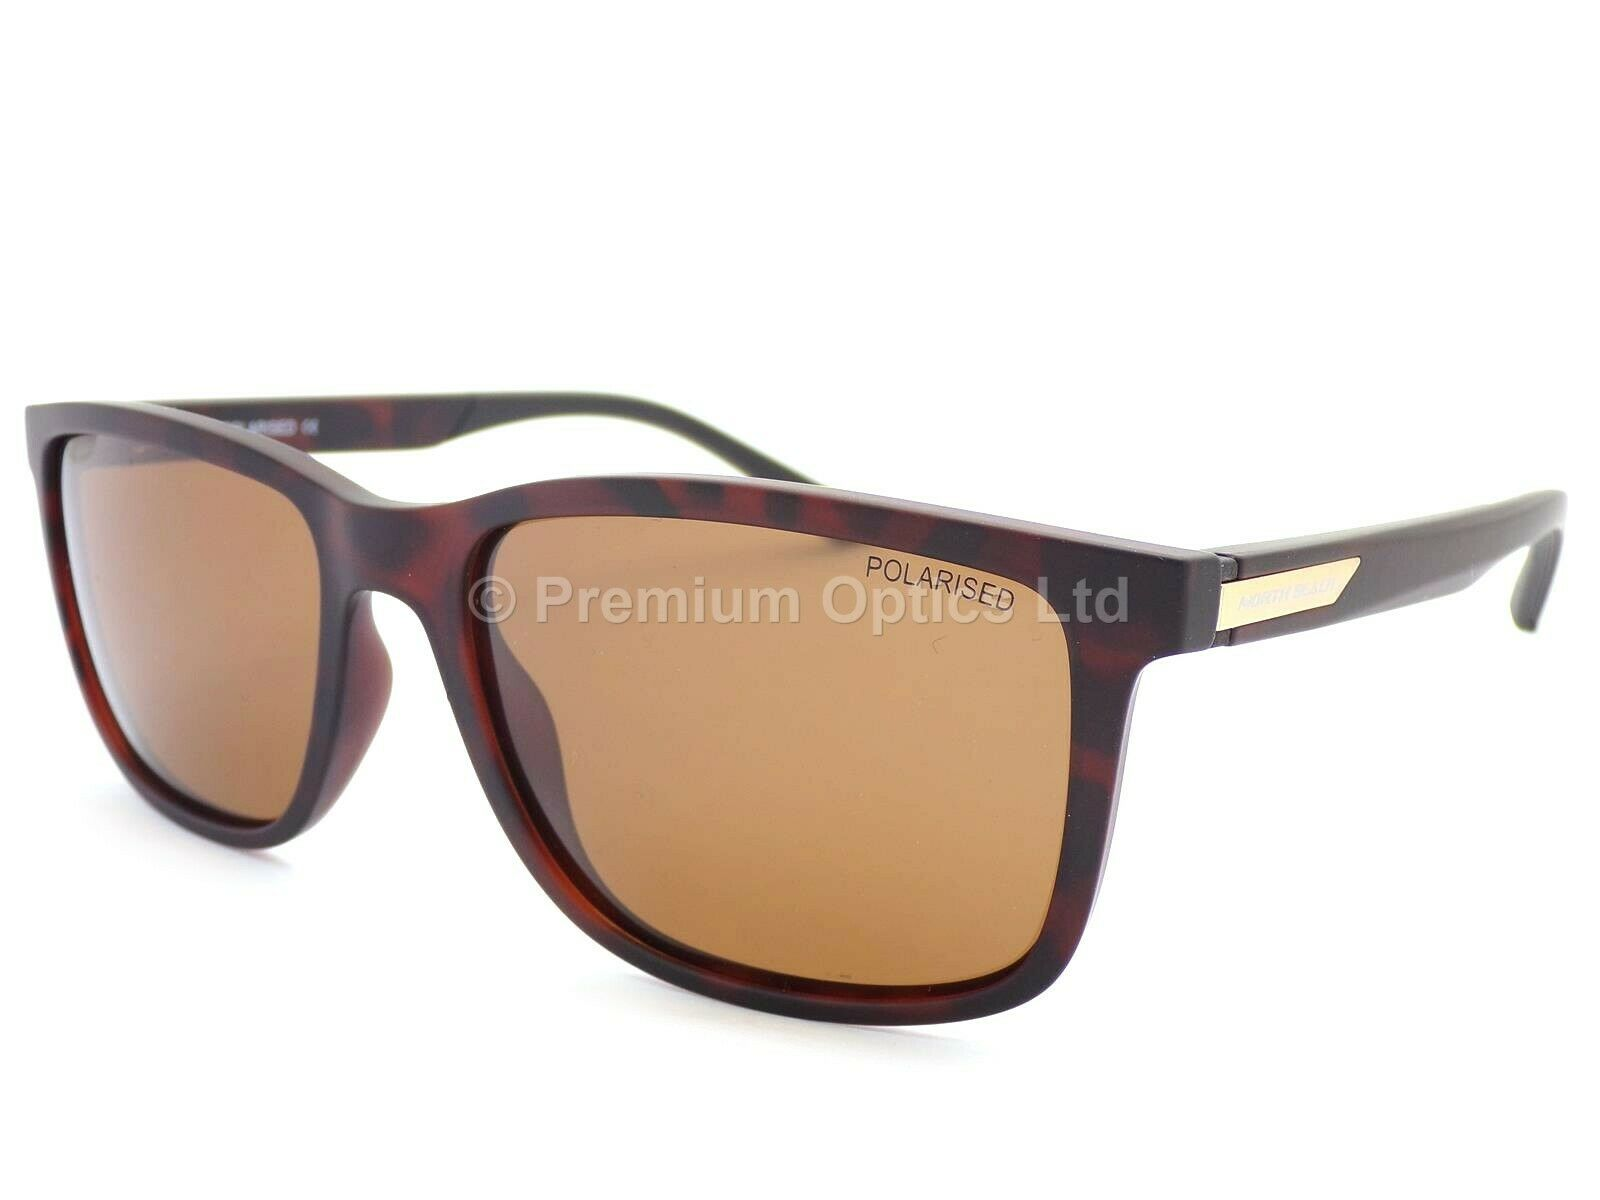 NORTH BEACH Polarised Sunglasses Pomfret Matt Brown Tortoise Brown 70528